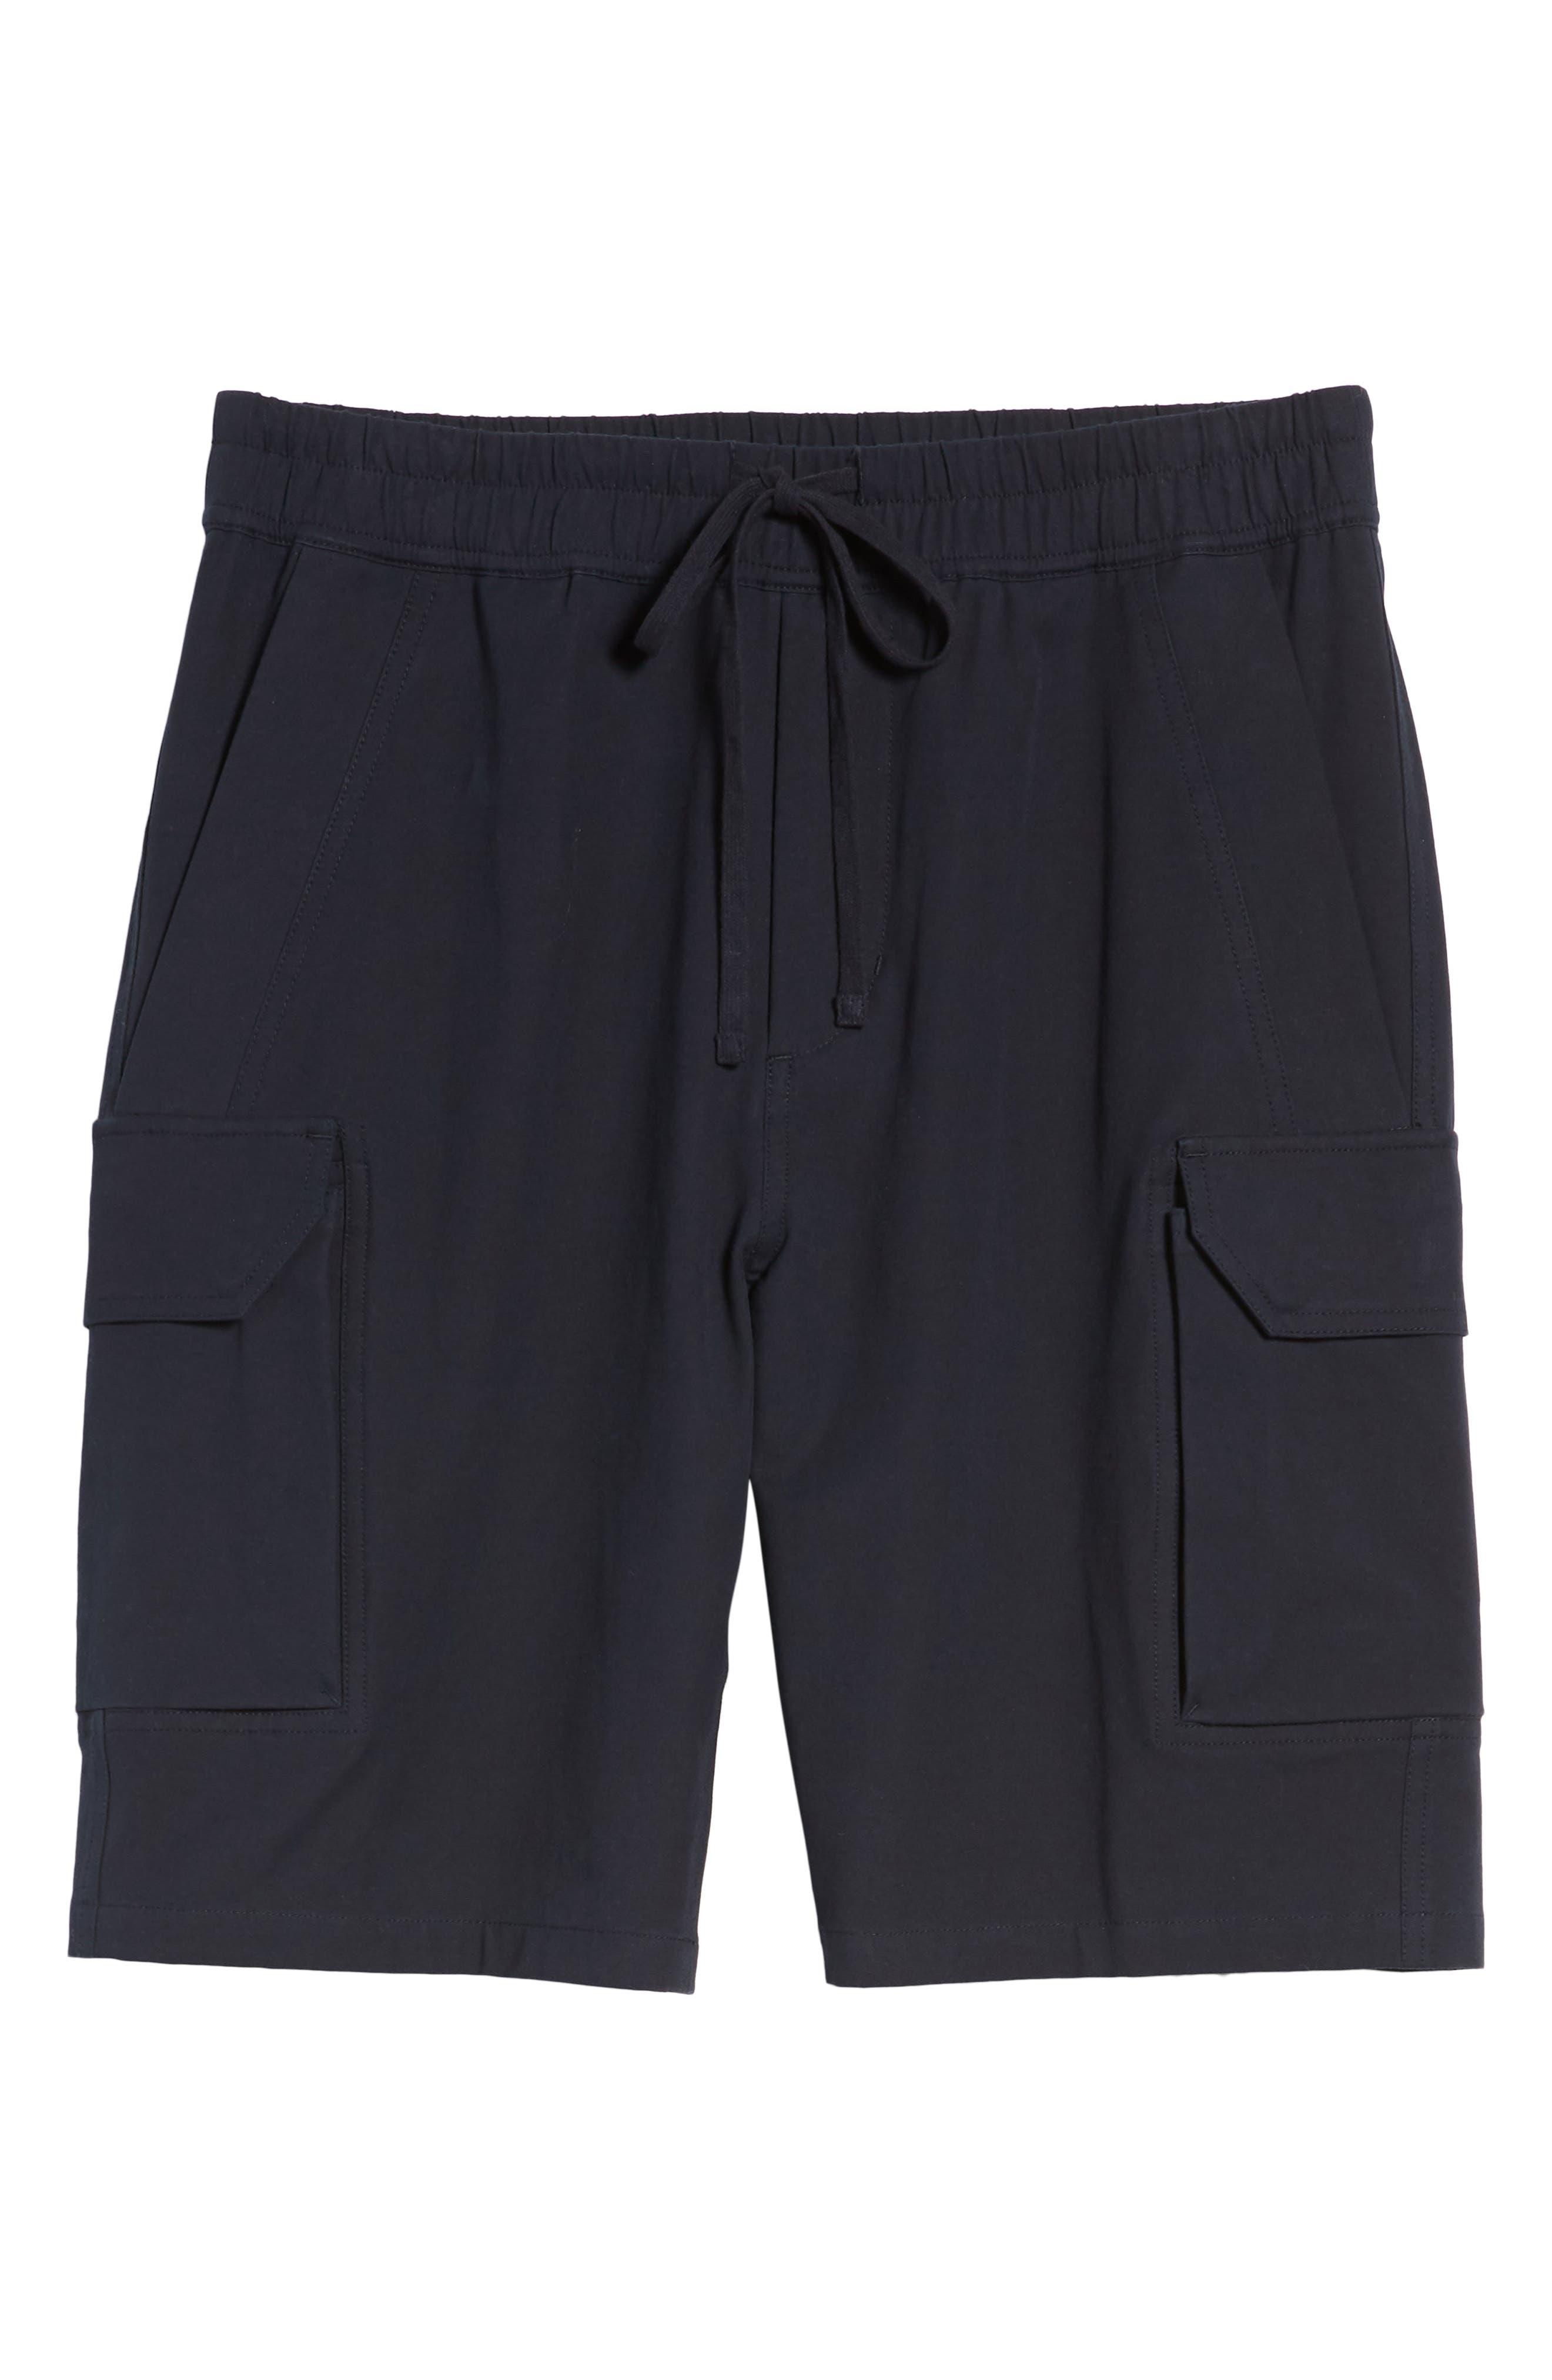 Regular Fit Drawstring Shorts,                             Alternate thumbnail 7, color,                             New Coastal